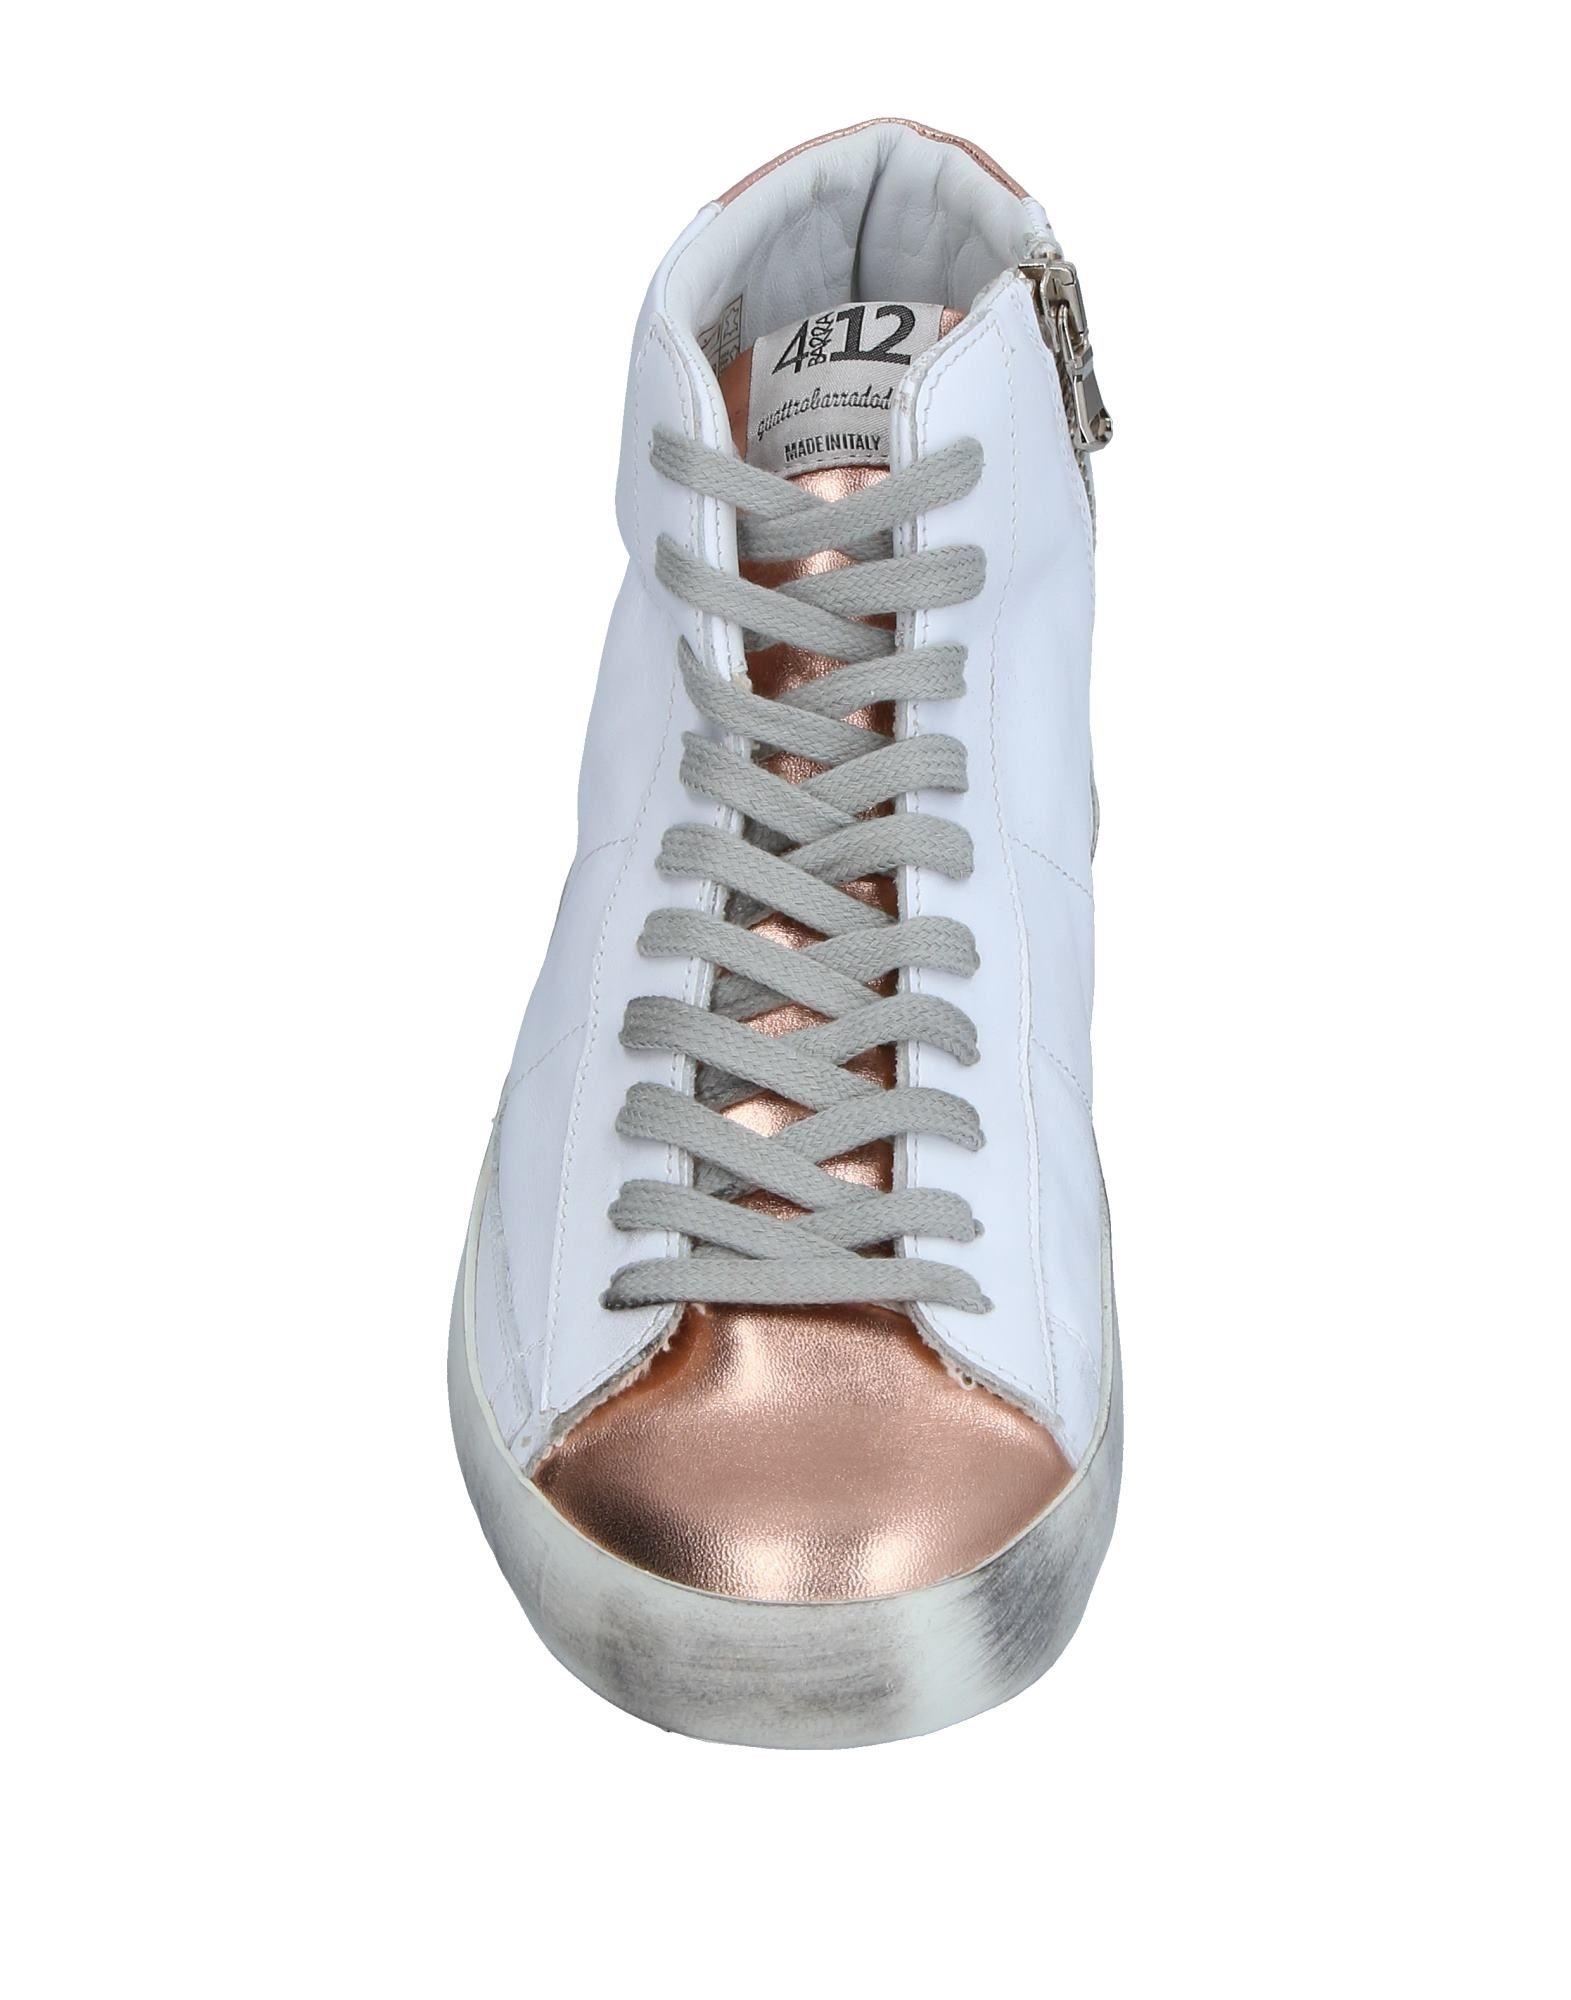 Quattrobarradodici Gute Sneakers Damen  11266072AG Gute Quattrobarradodici Qualität beliebte Schuhe 5076d6